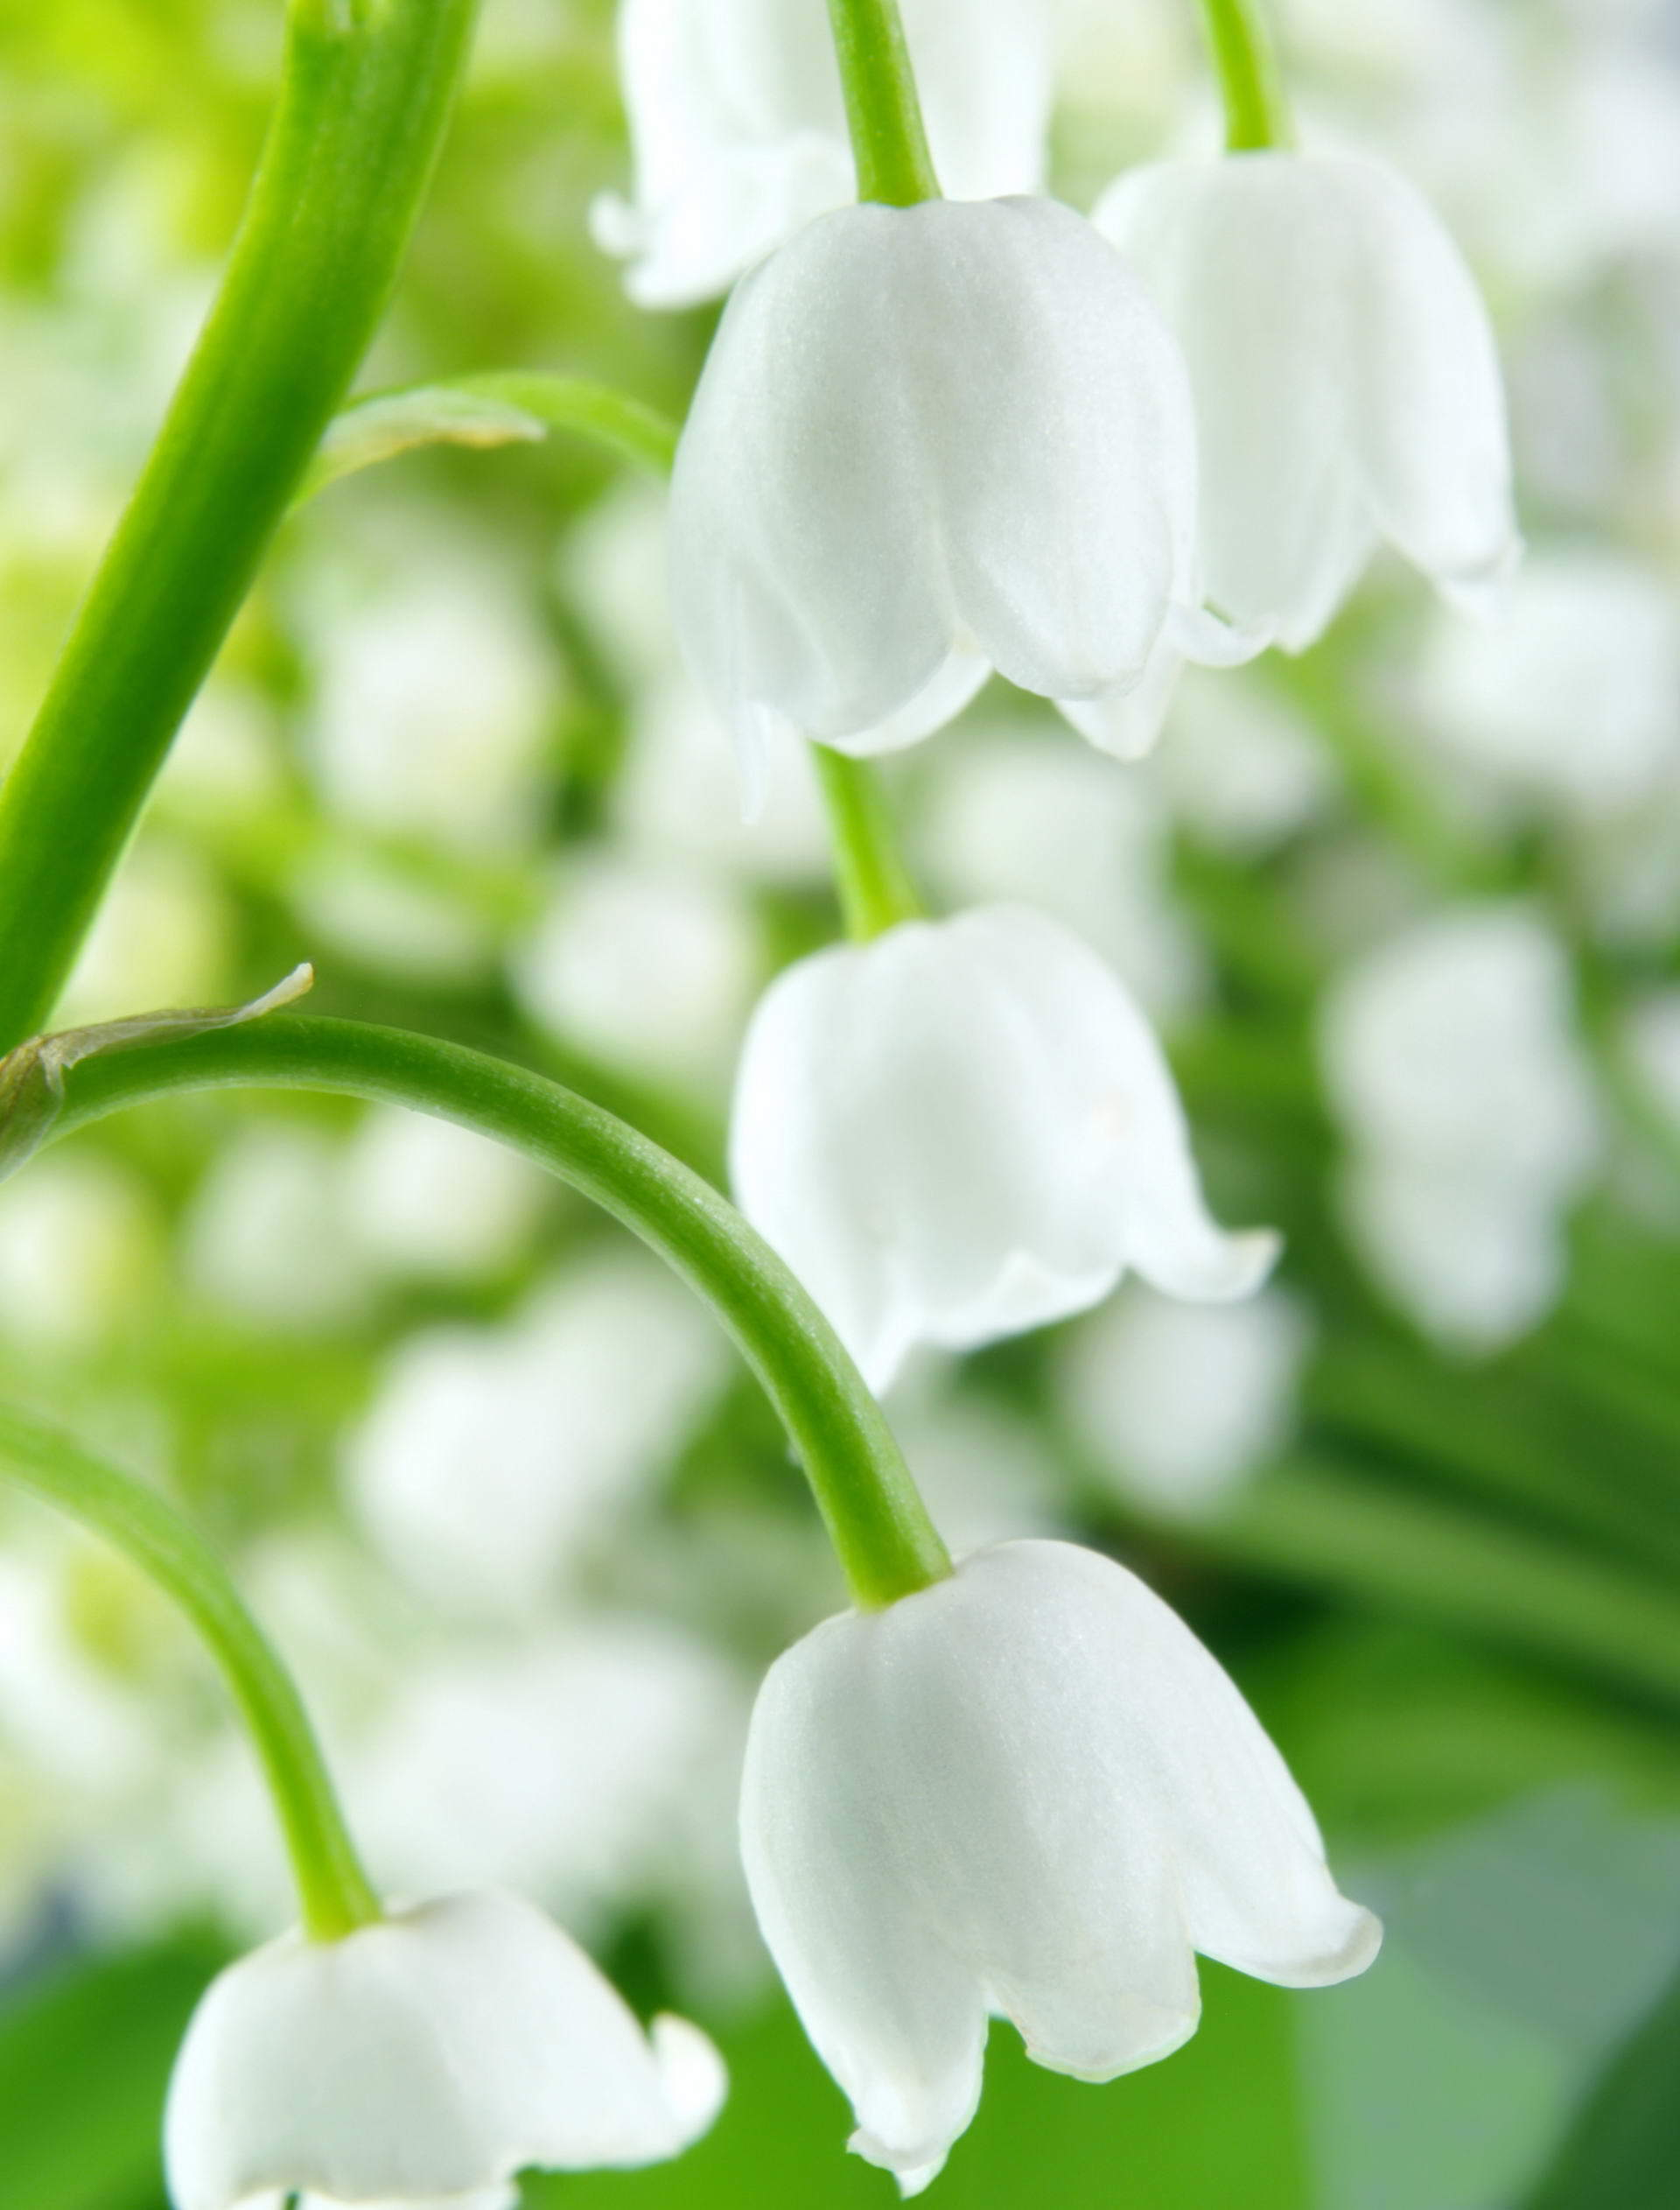 10117 descargar fondo de pantalla Plantas, Flores, Campanillas: protectores de pantalla e imágenes gratis